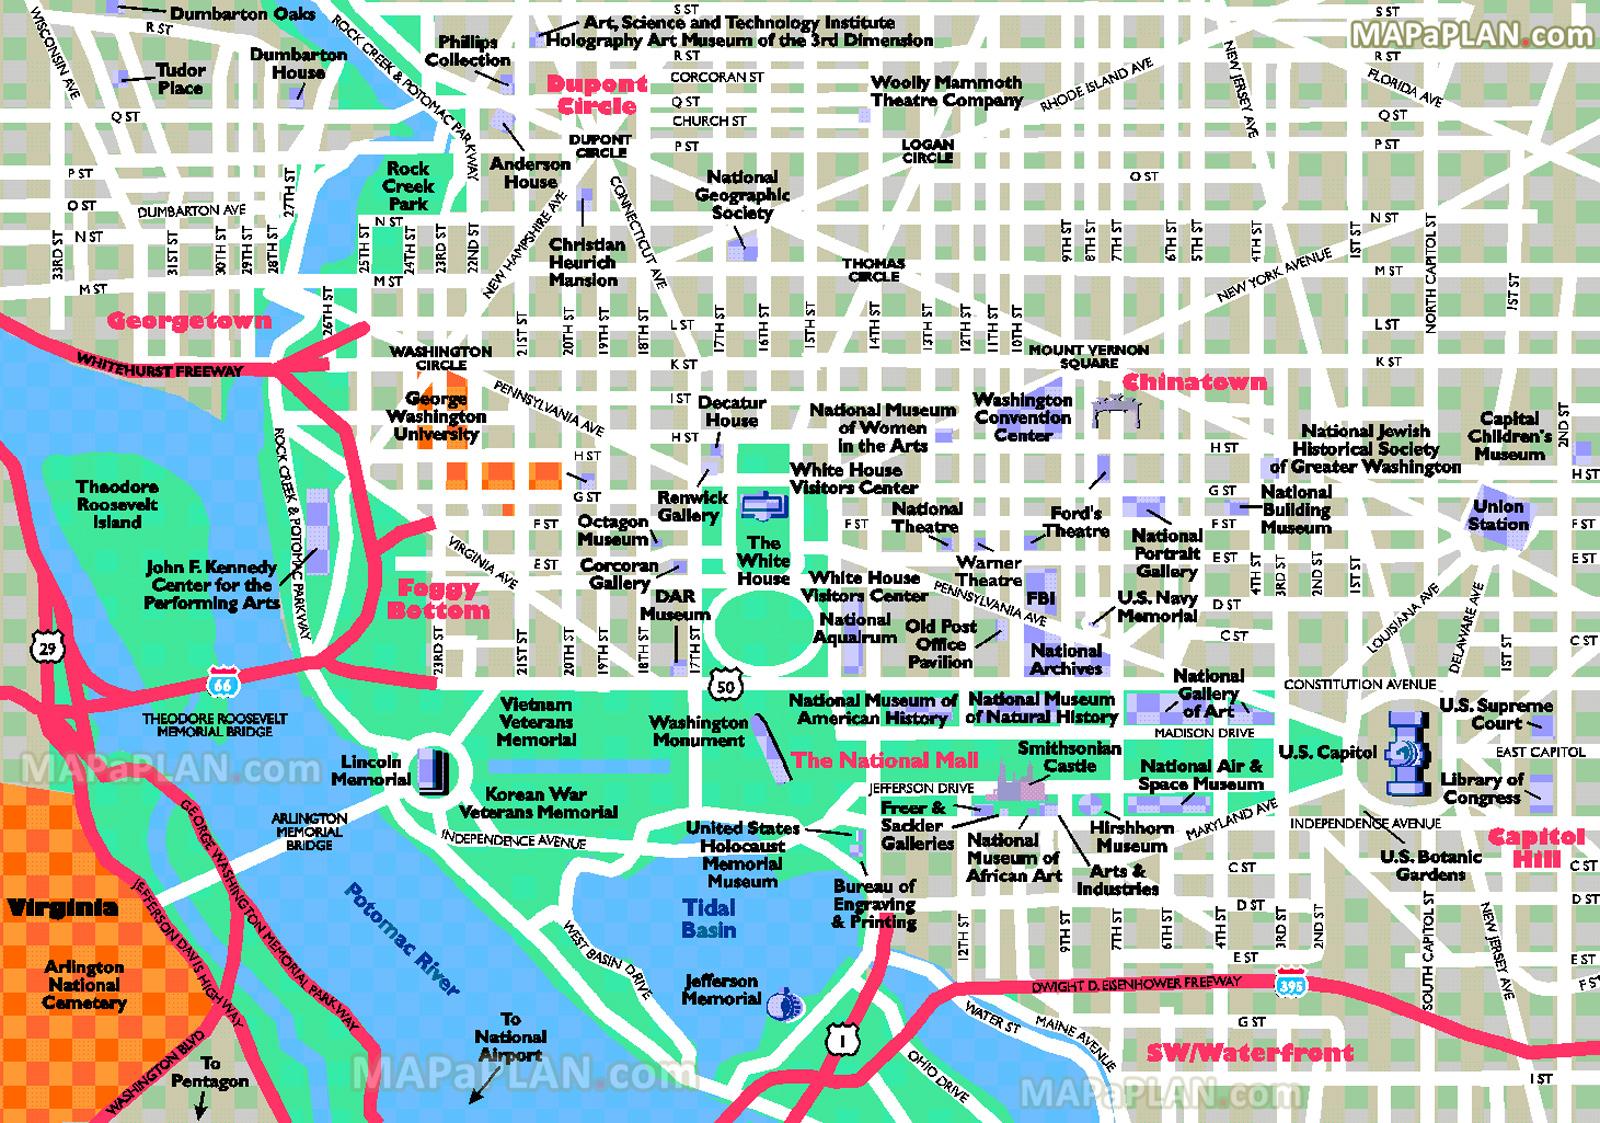 Washington Dc Maps - Top Tourist Attractions - Free, Printable City - Printable Map Of Washington Dc